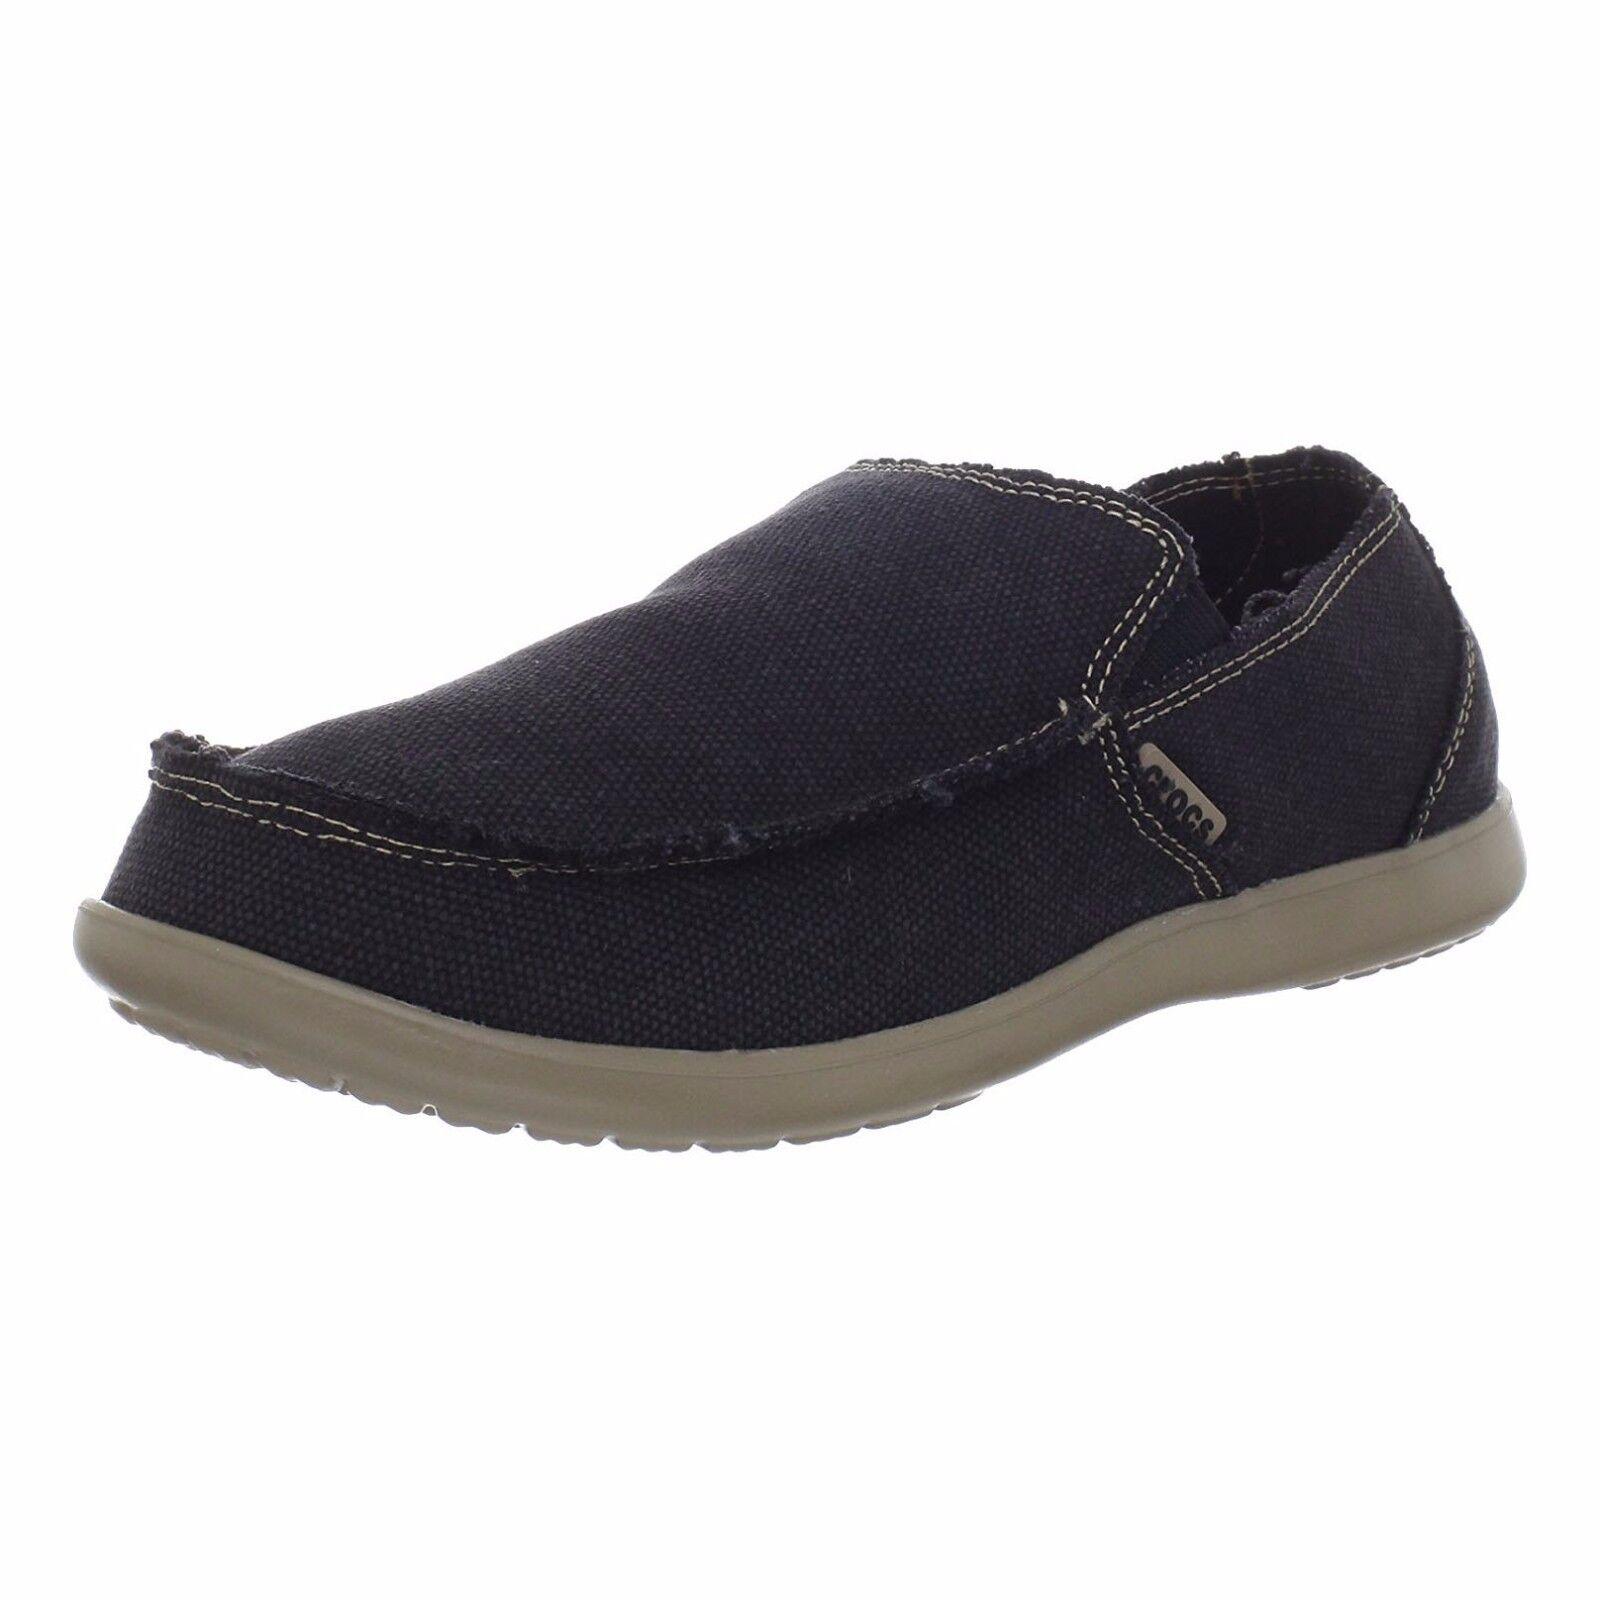 Mens Crocs Santa Cruz Fashion Loafer Black Canvas Casual Beach All SZs NIB